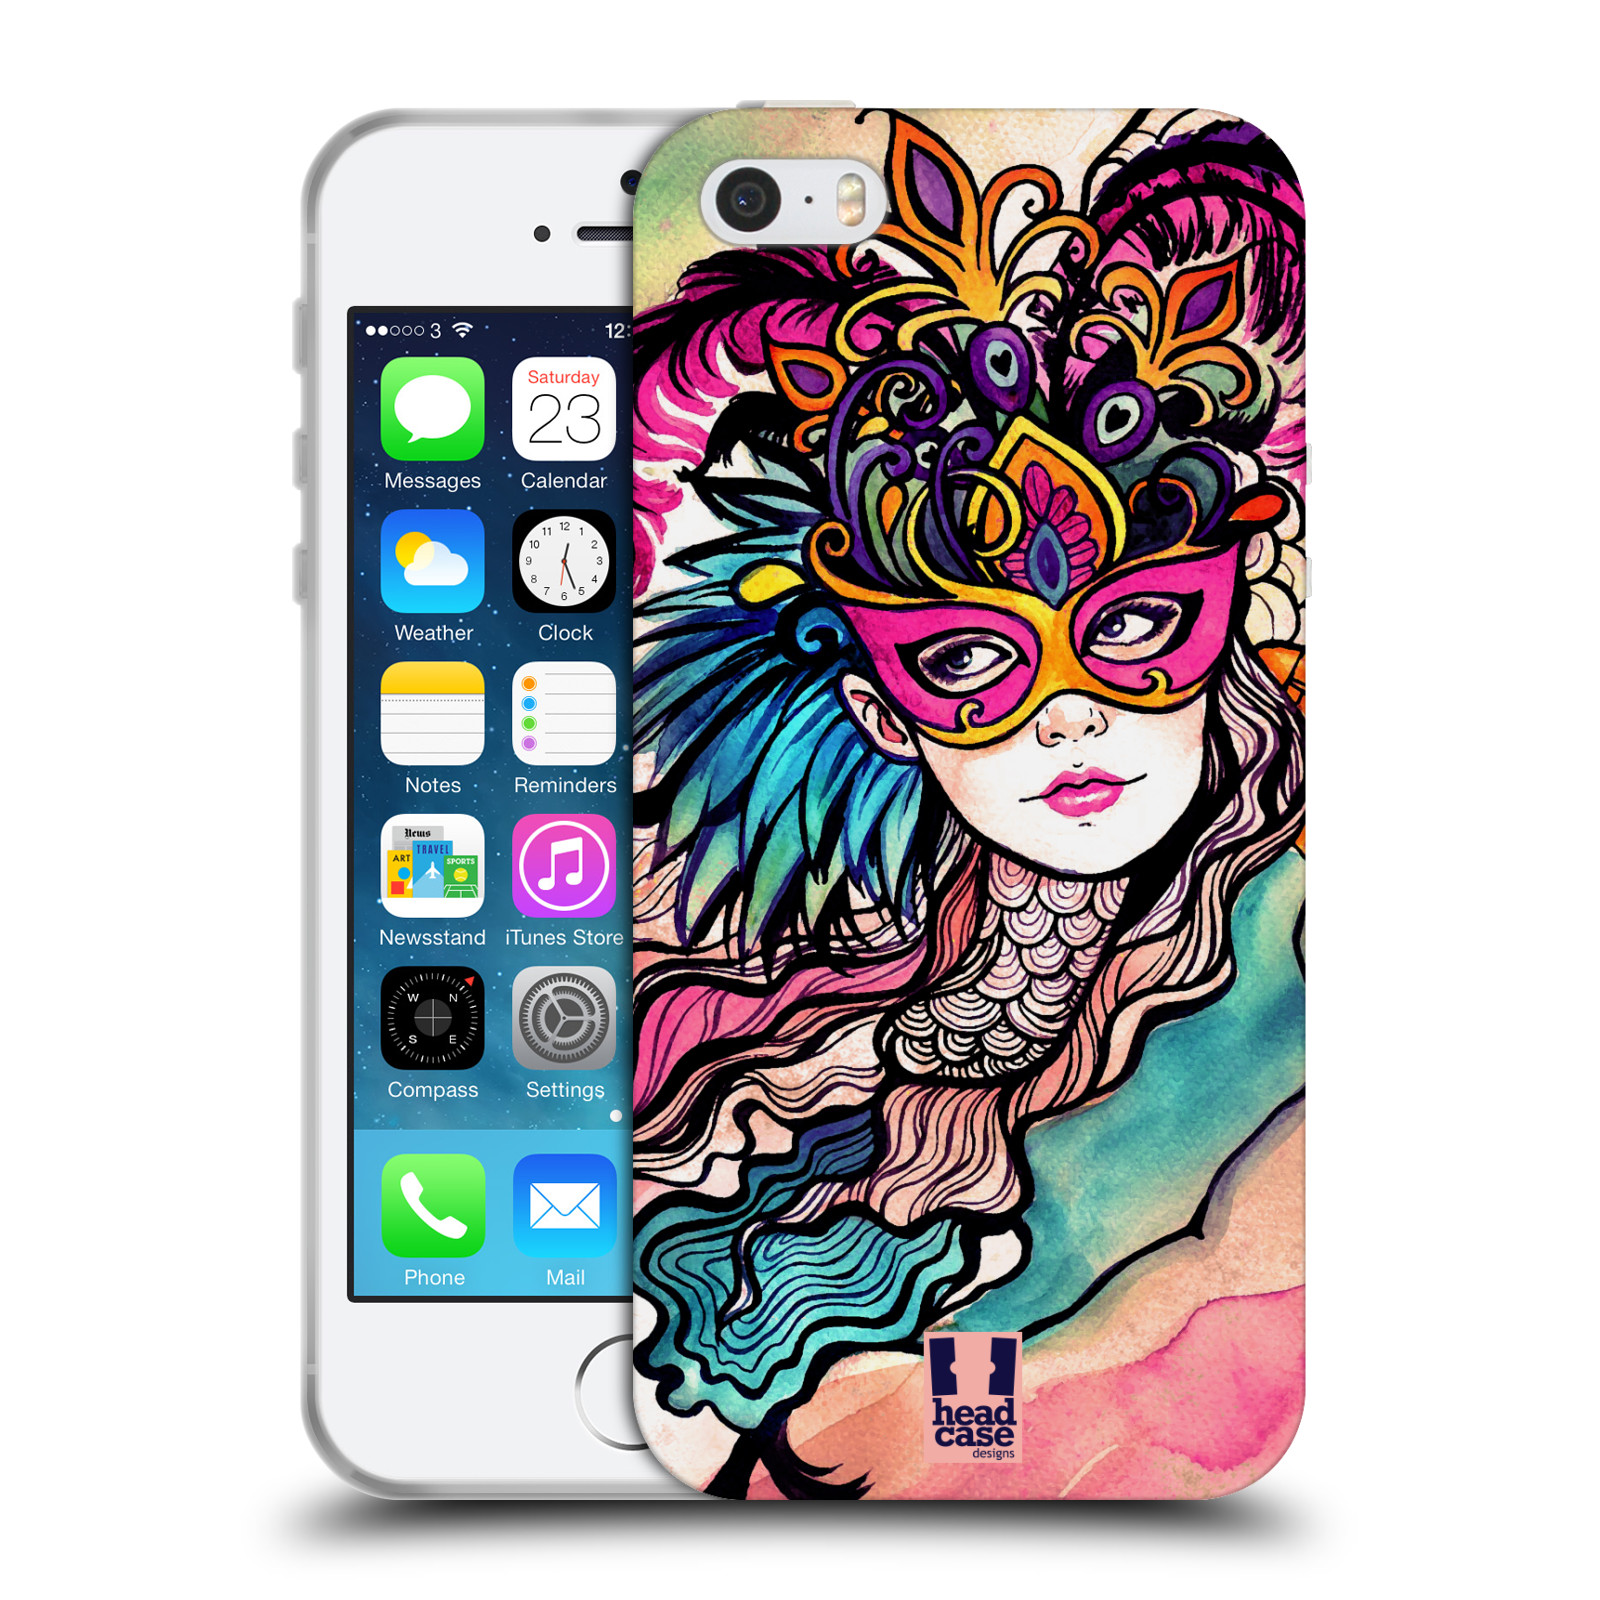 HEAD CASE silikonový obal na mobil Apple Iphone 5/5S vzor Maškarní ples masky kreslené vzory růžová